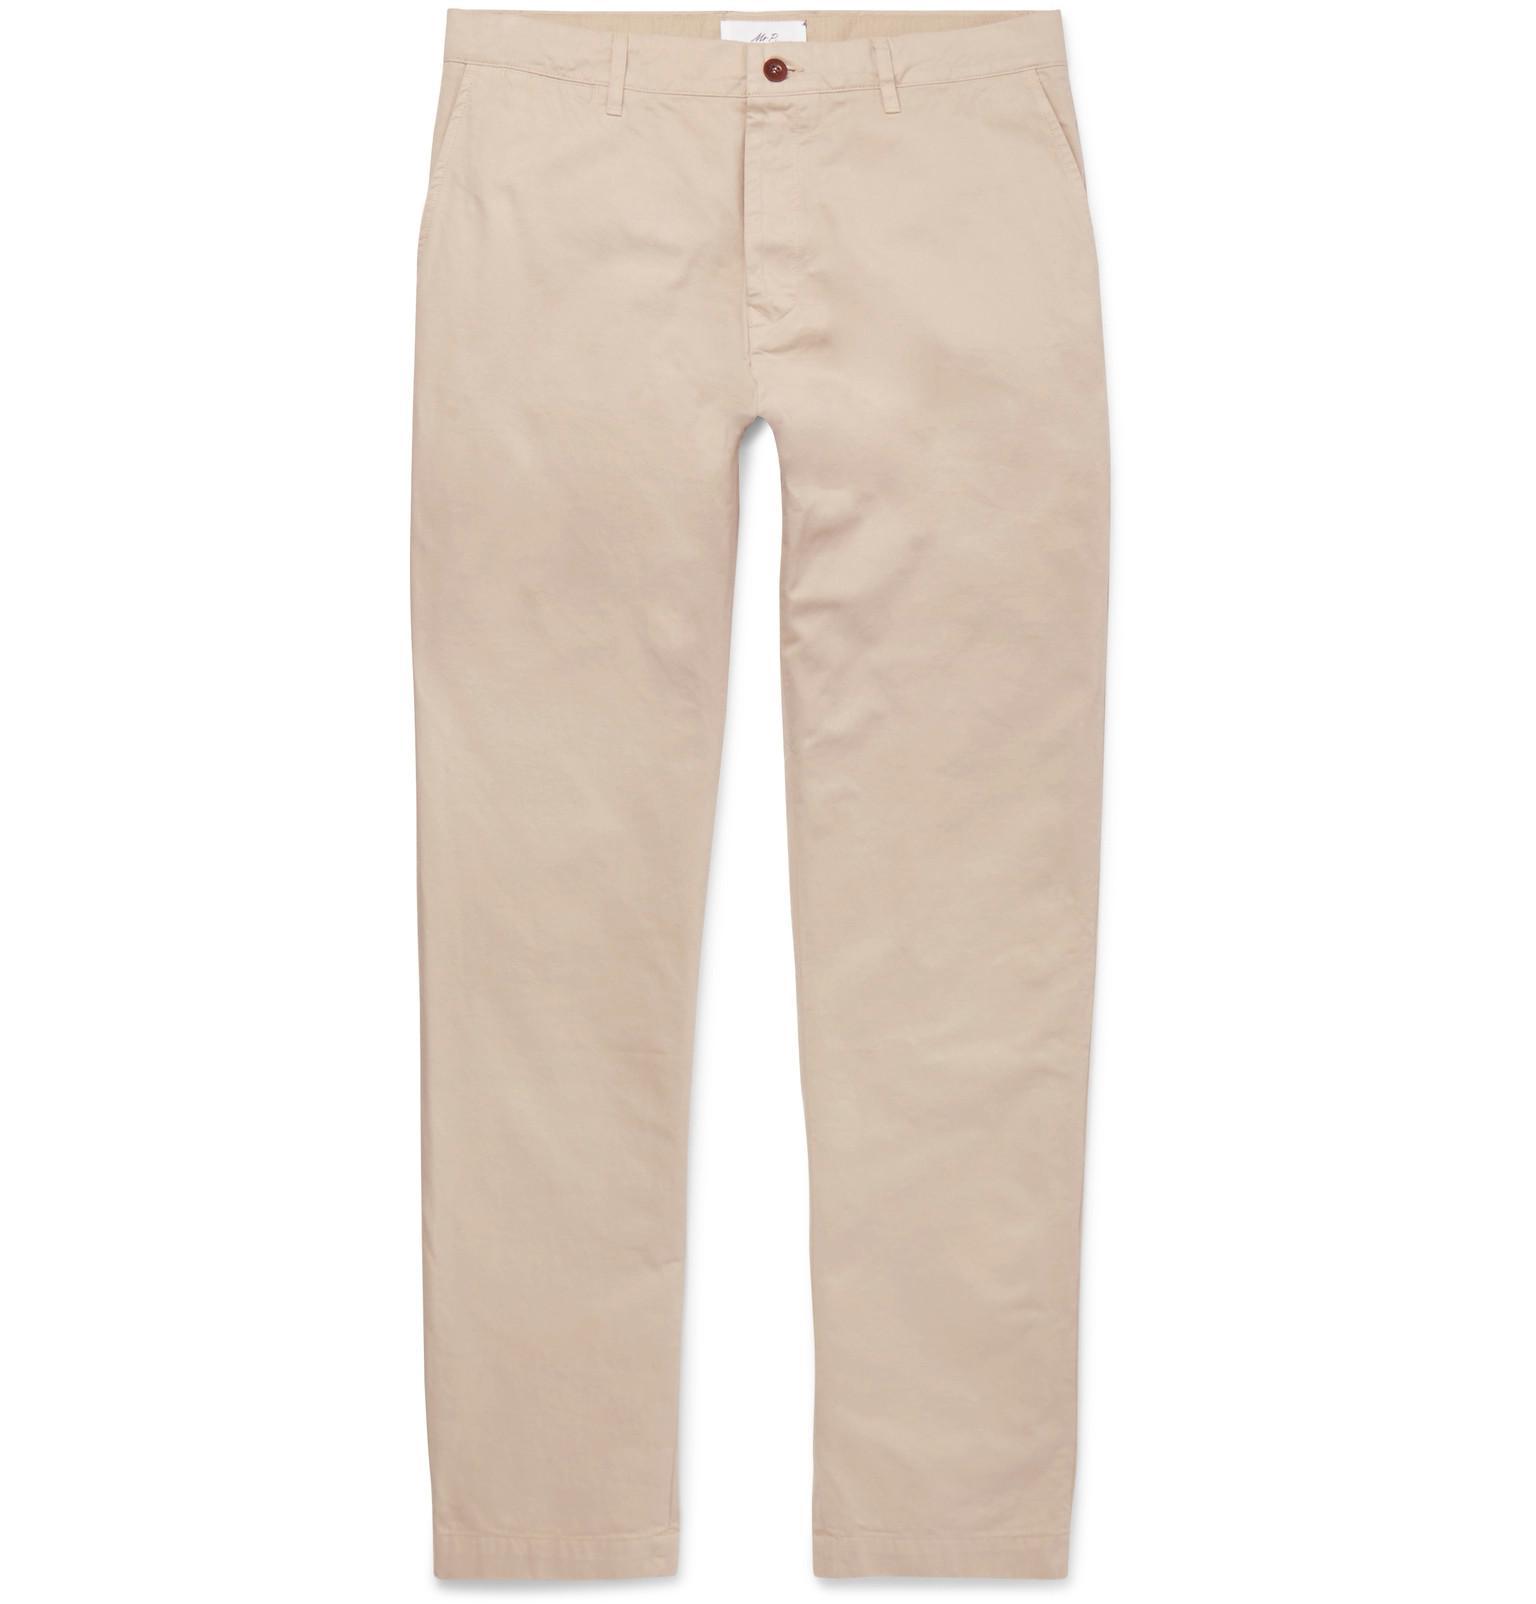 Wide-leg Garment-dyed Cotton-twill Chinos Mr P. 4fhWl0mk